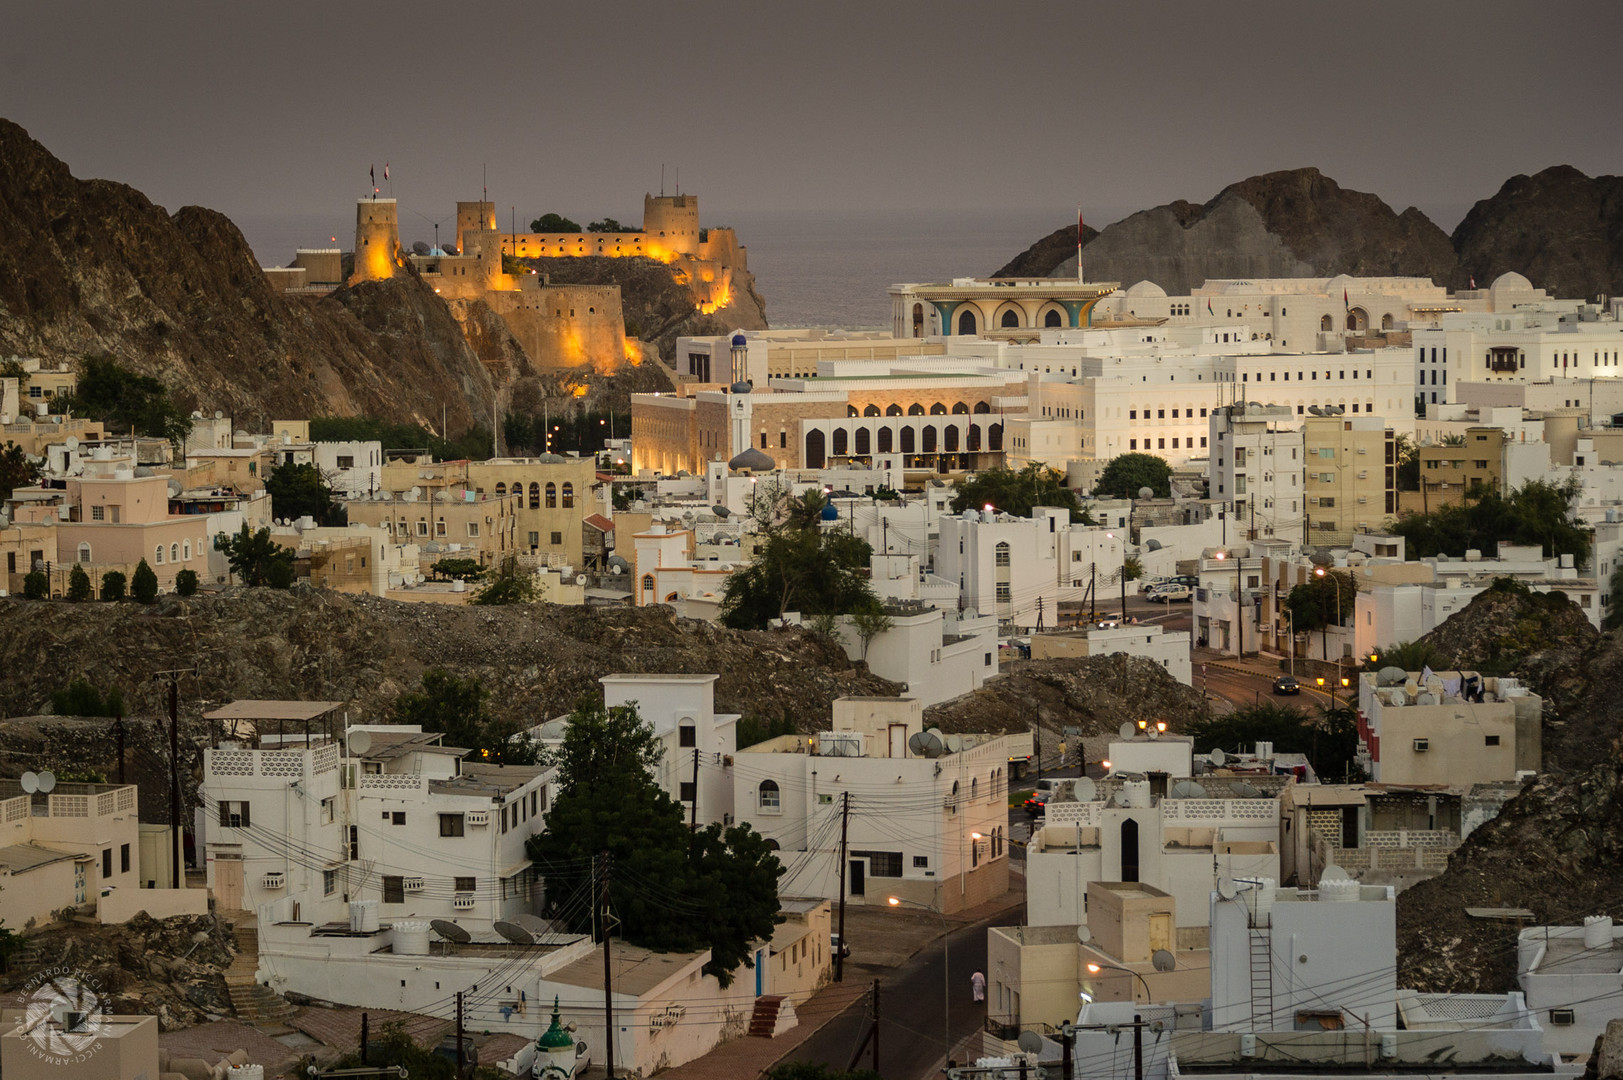 Muscat-Oman-City-Landscape-2011.01.05-20